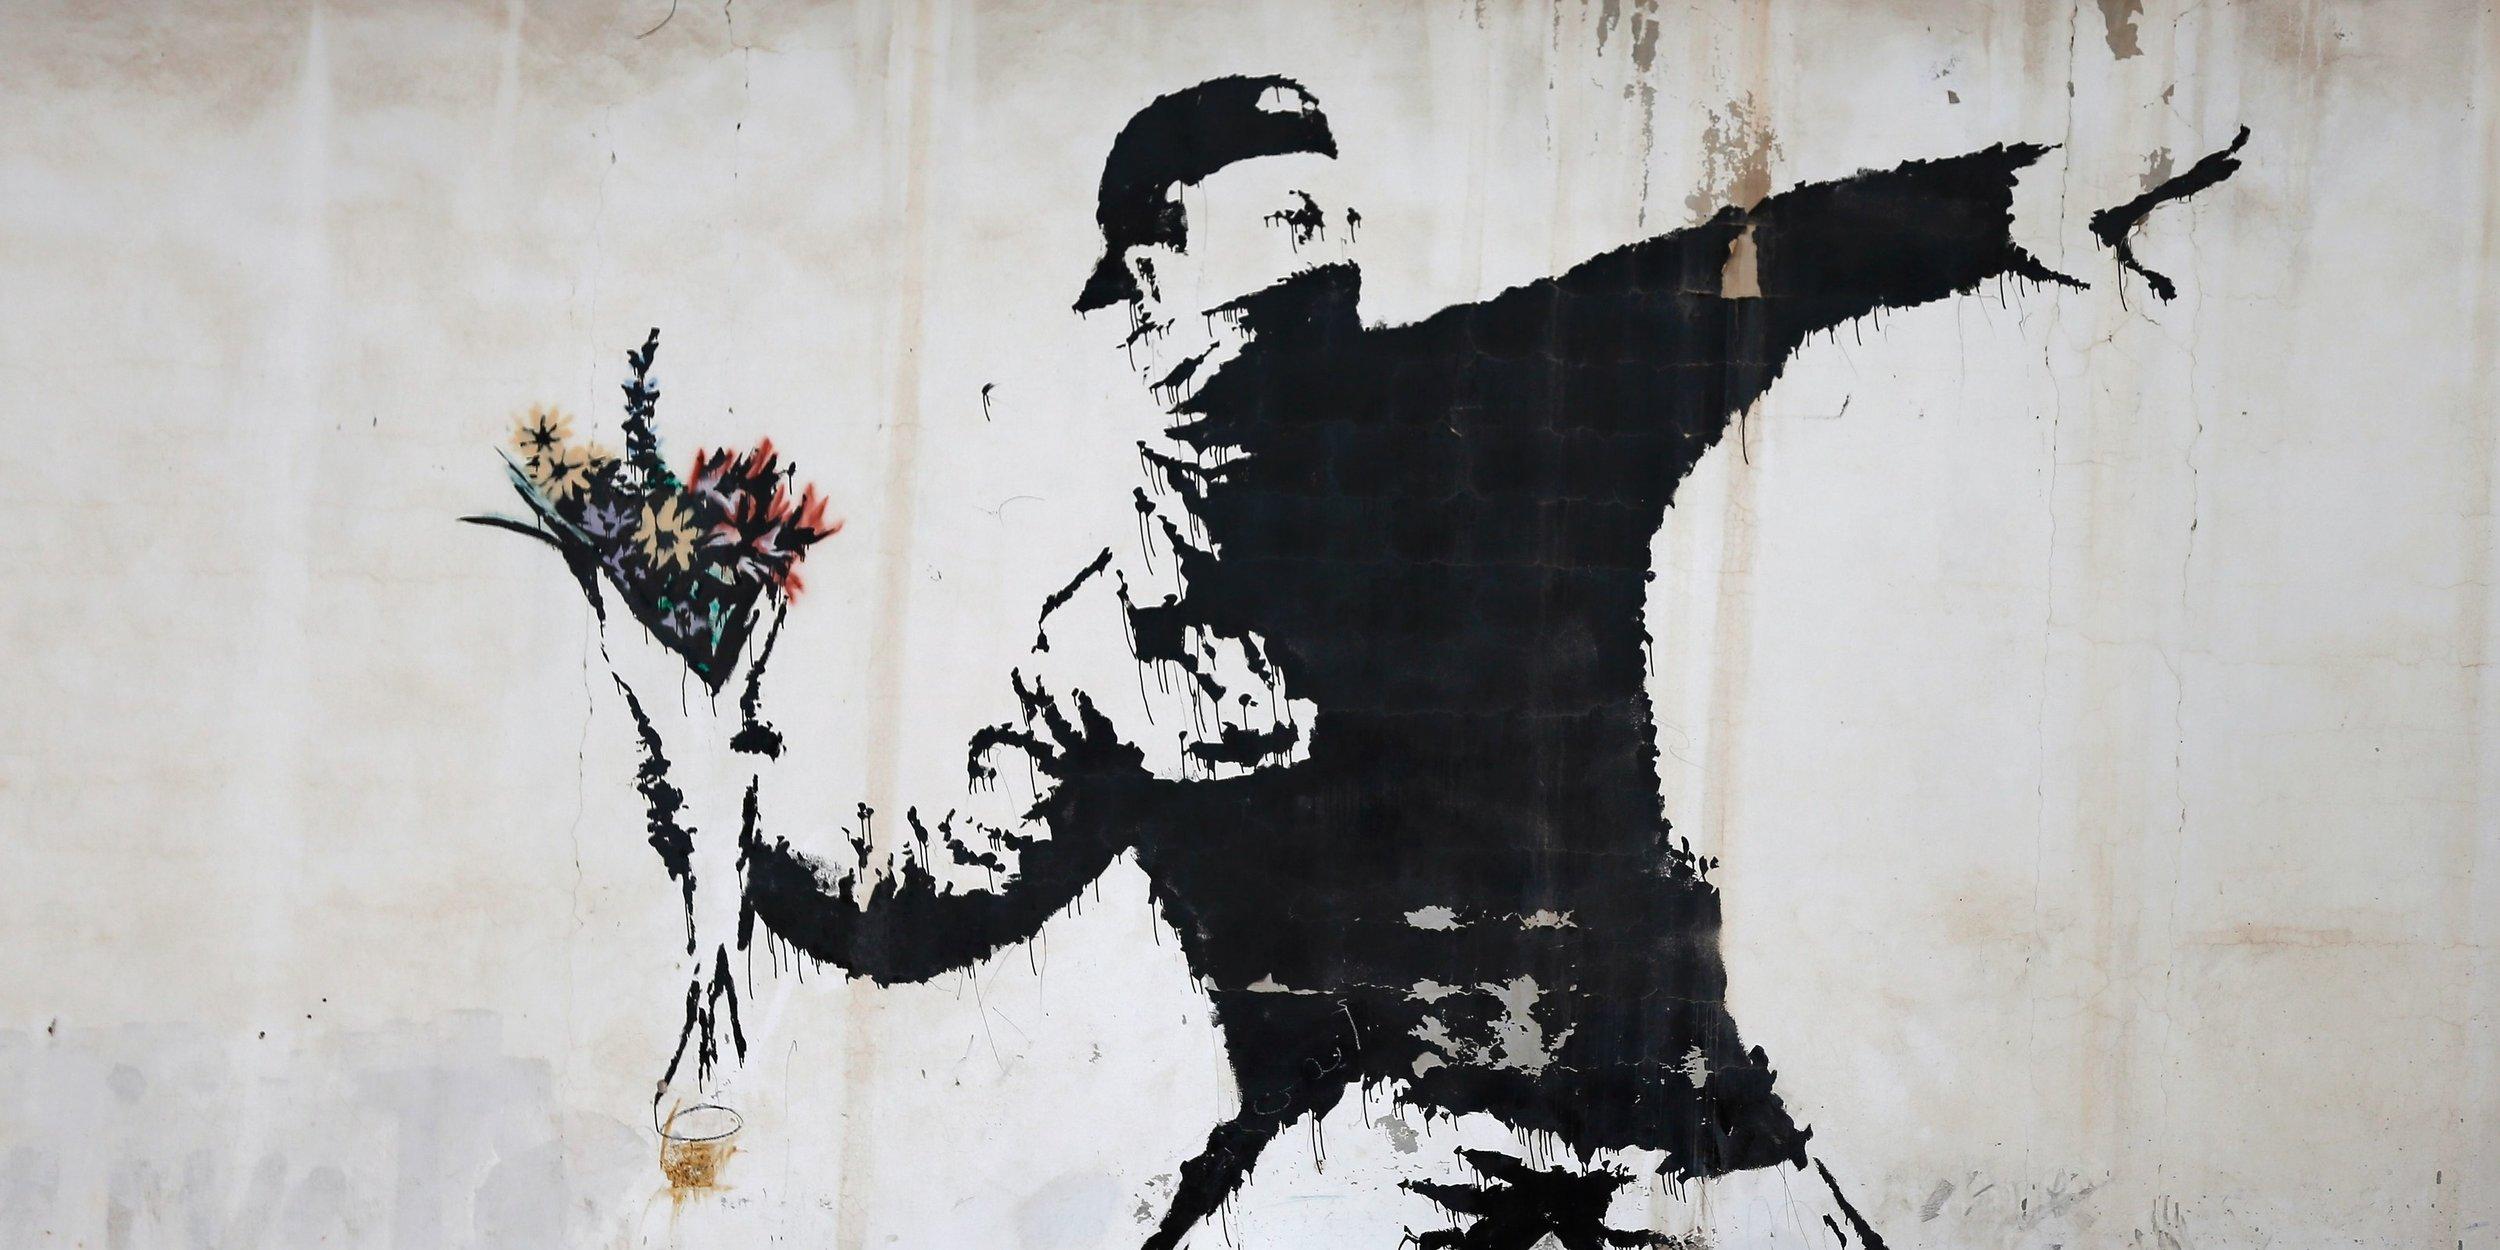 """Rage, Flower Thrower"" by Banksy (2003)"